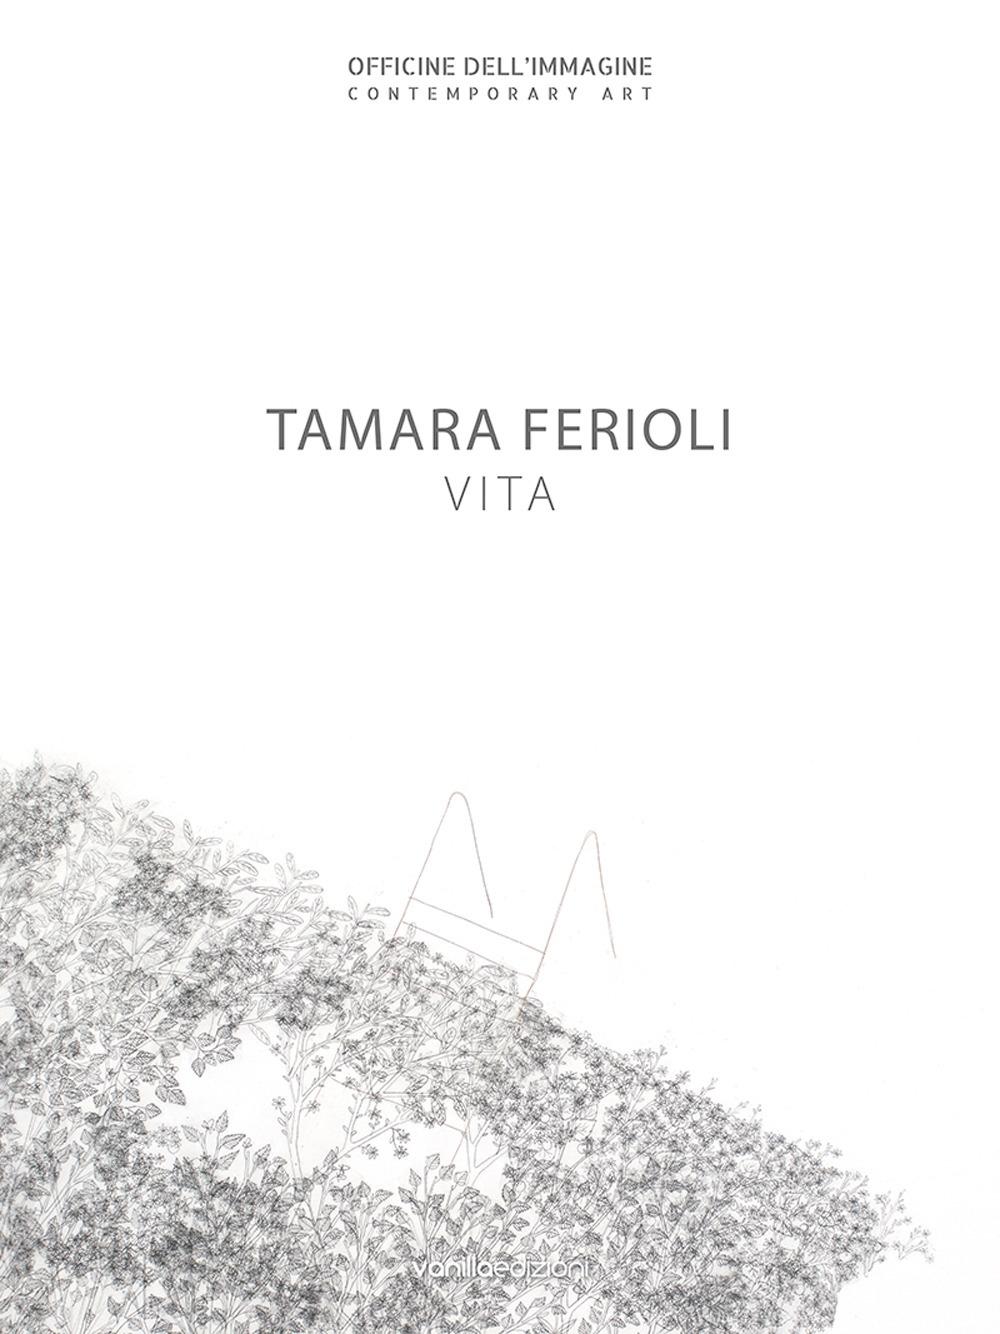 Tamara Ferioli. Vita